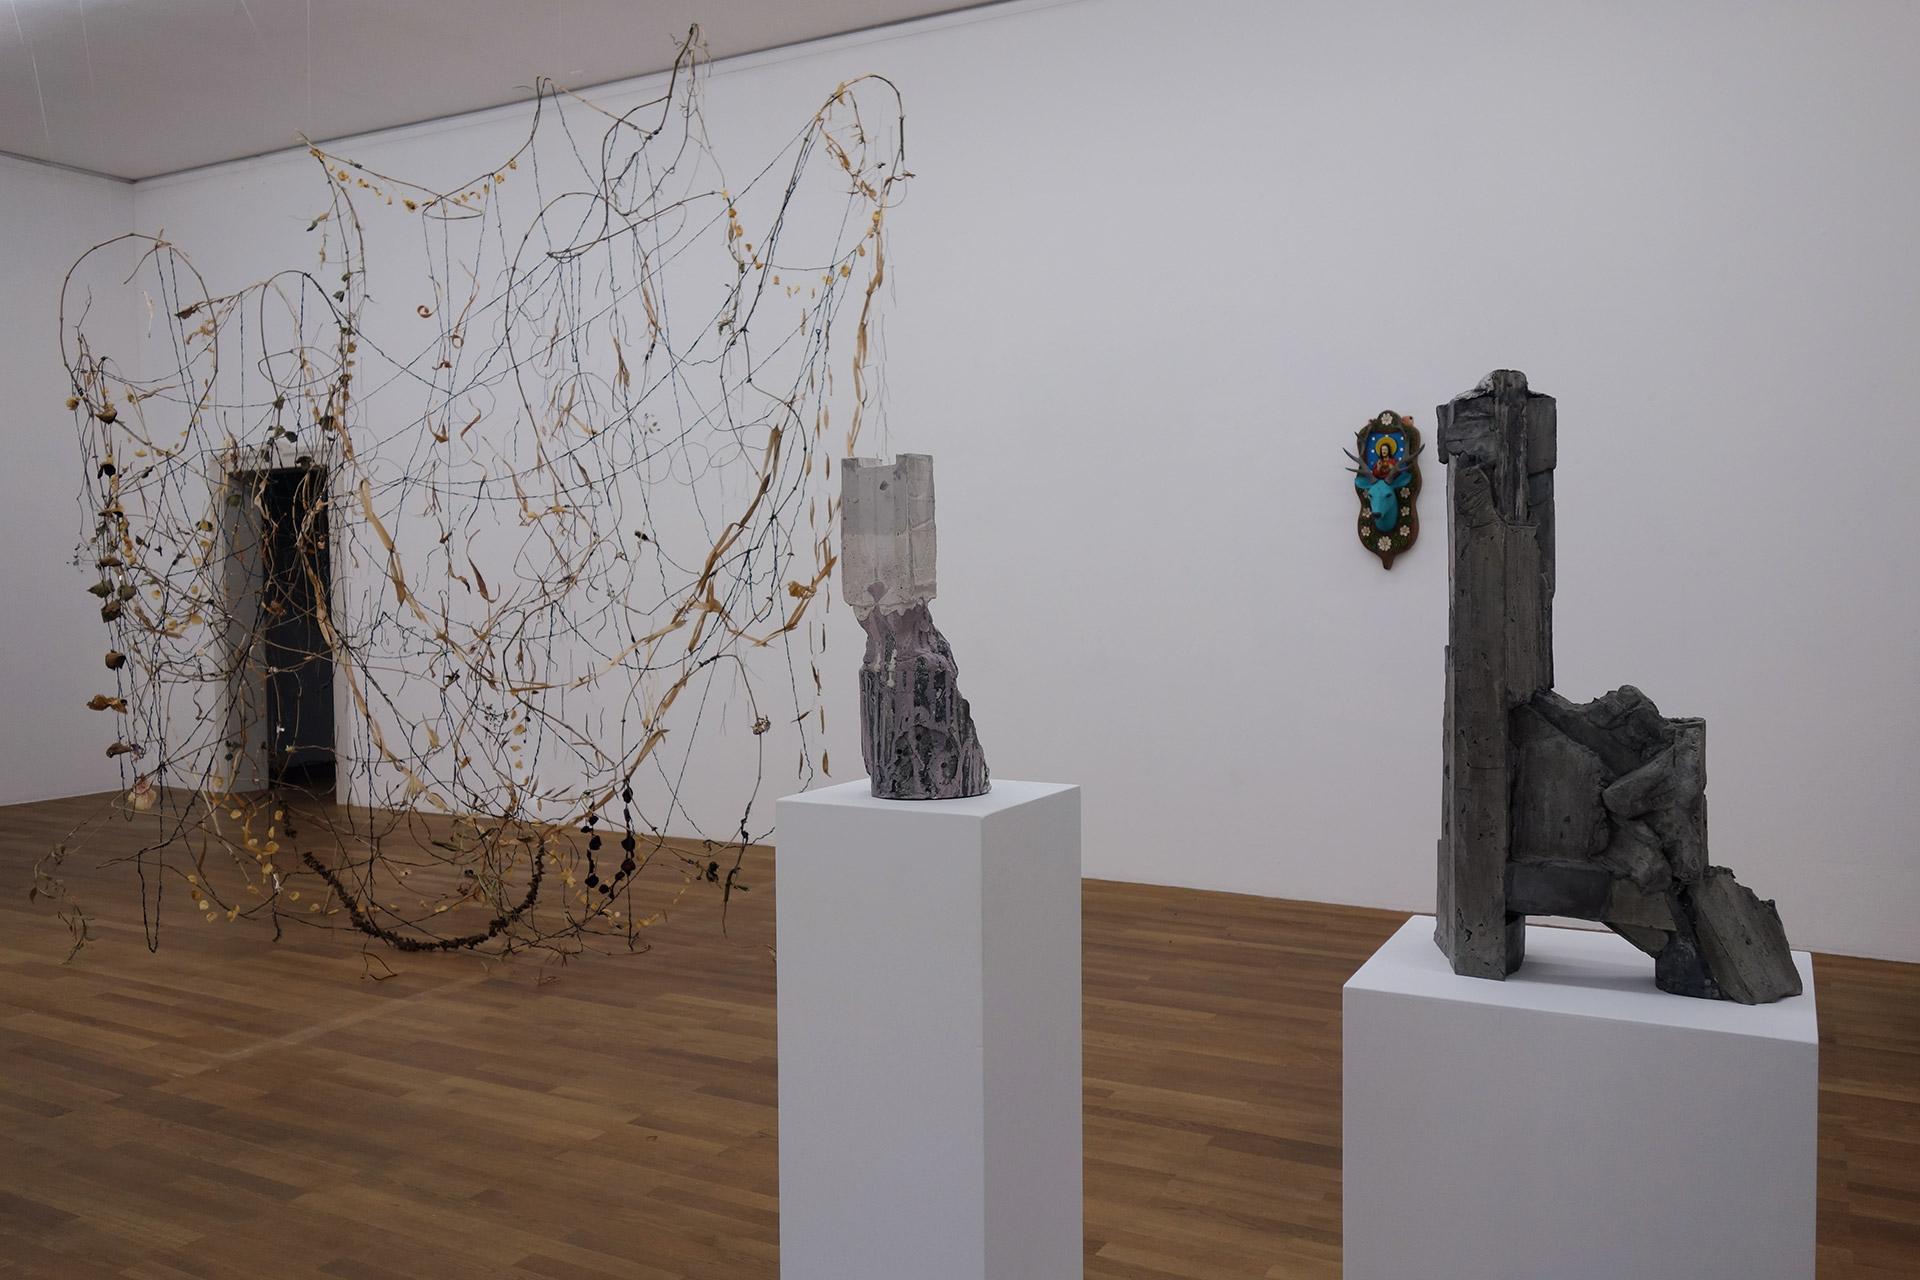 Kunsthalle-Winterthur-Dezember-Ausstellung-2017-5.jpg